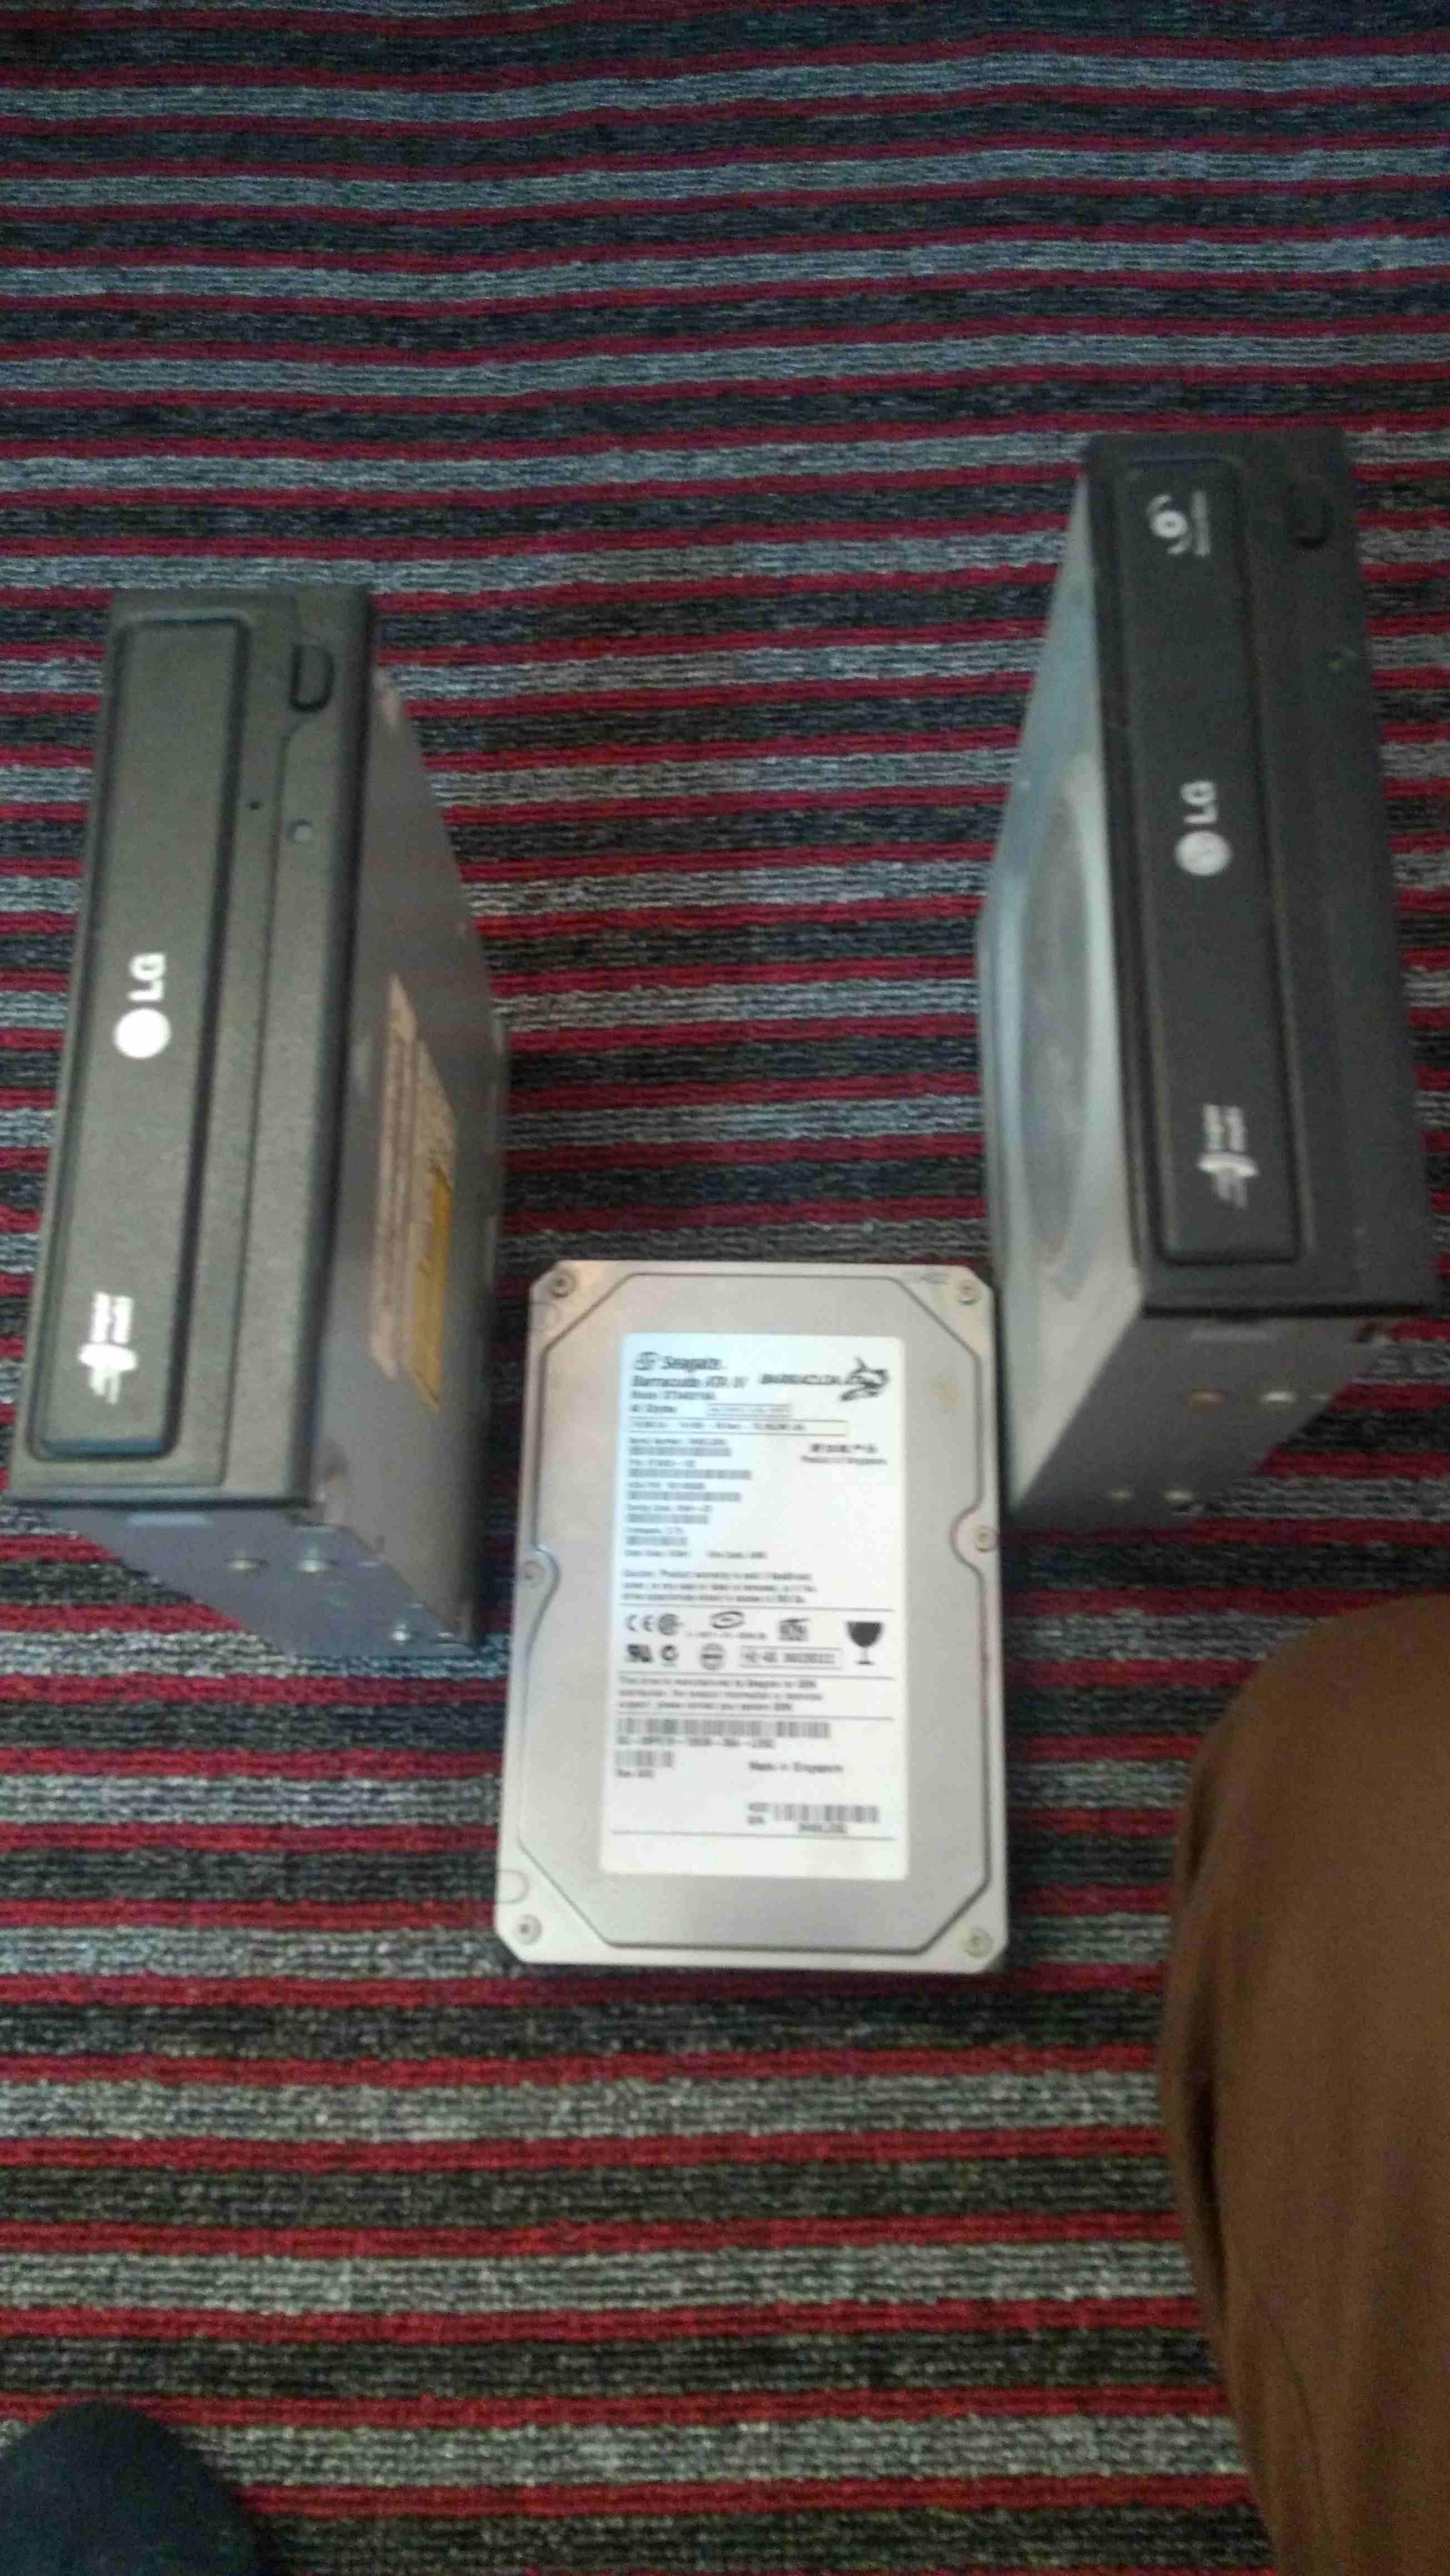 Dell - Inspiron / 16GB RAM, i7, 3.2MHz, 2in1 Laptop-  هاردسك و cd عدد اثنين...